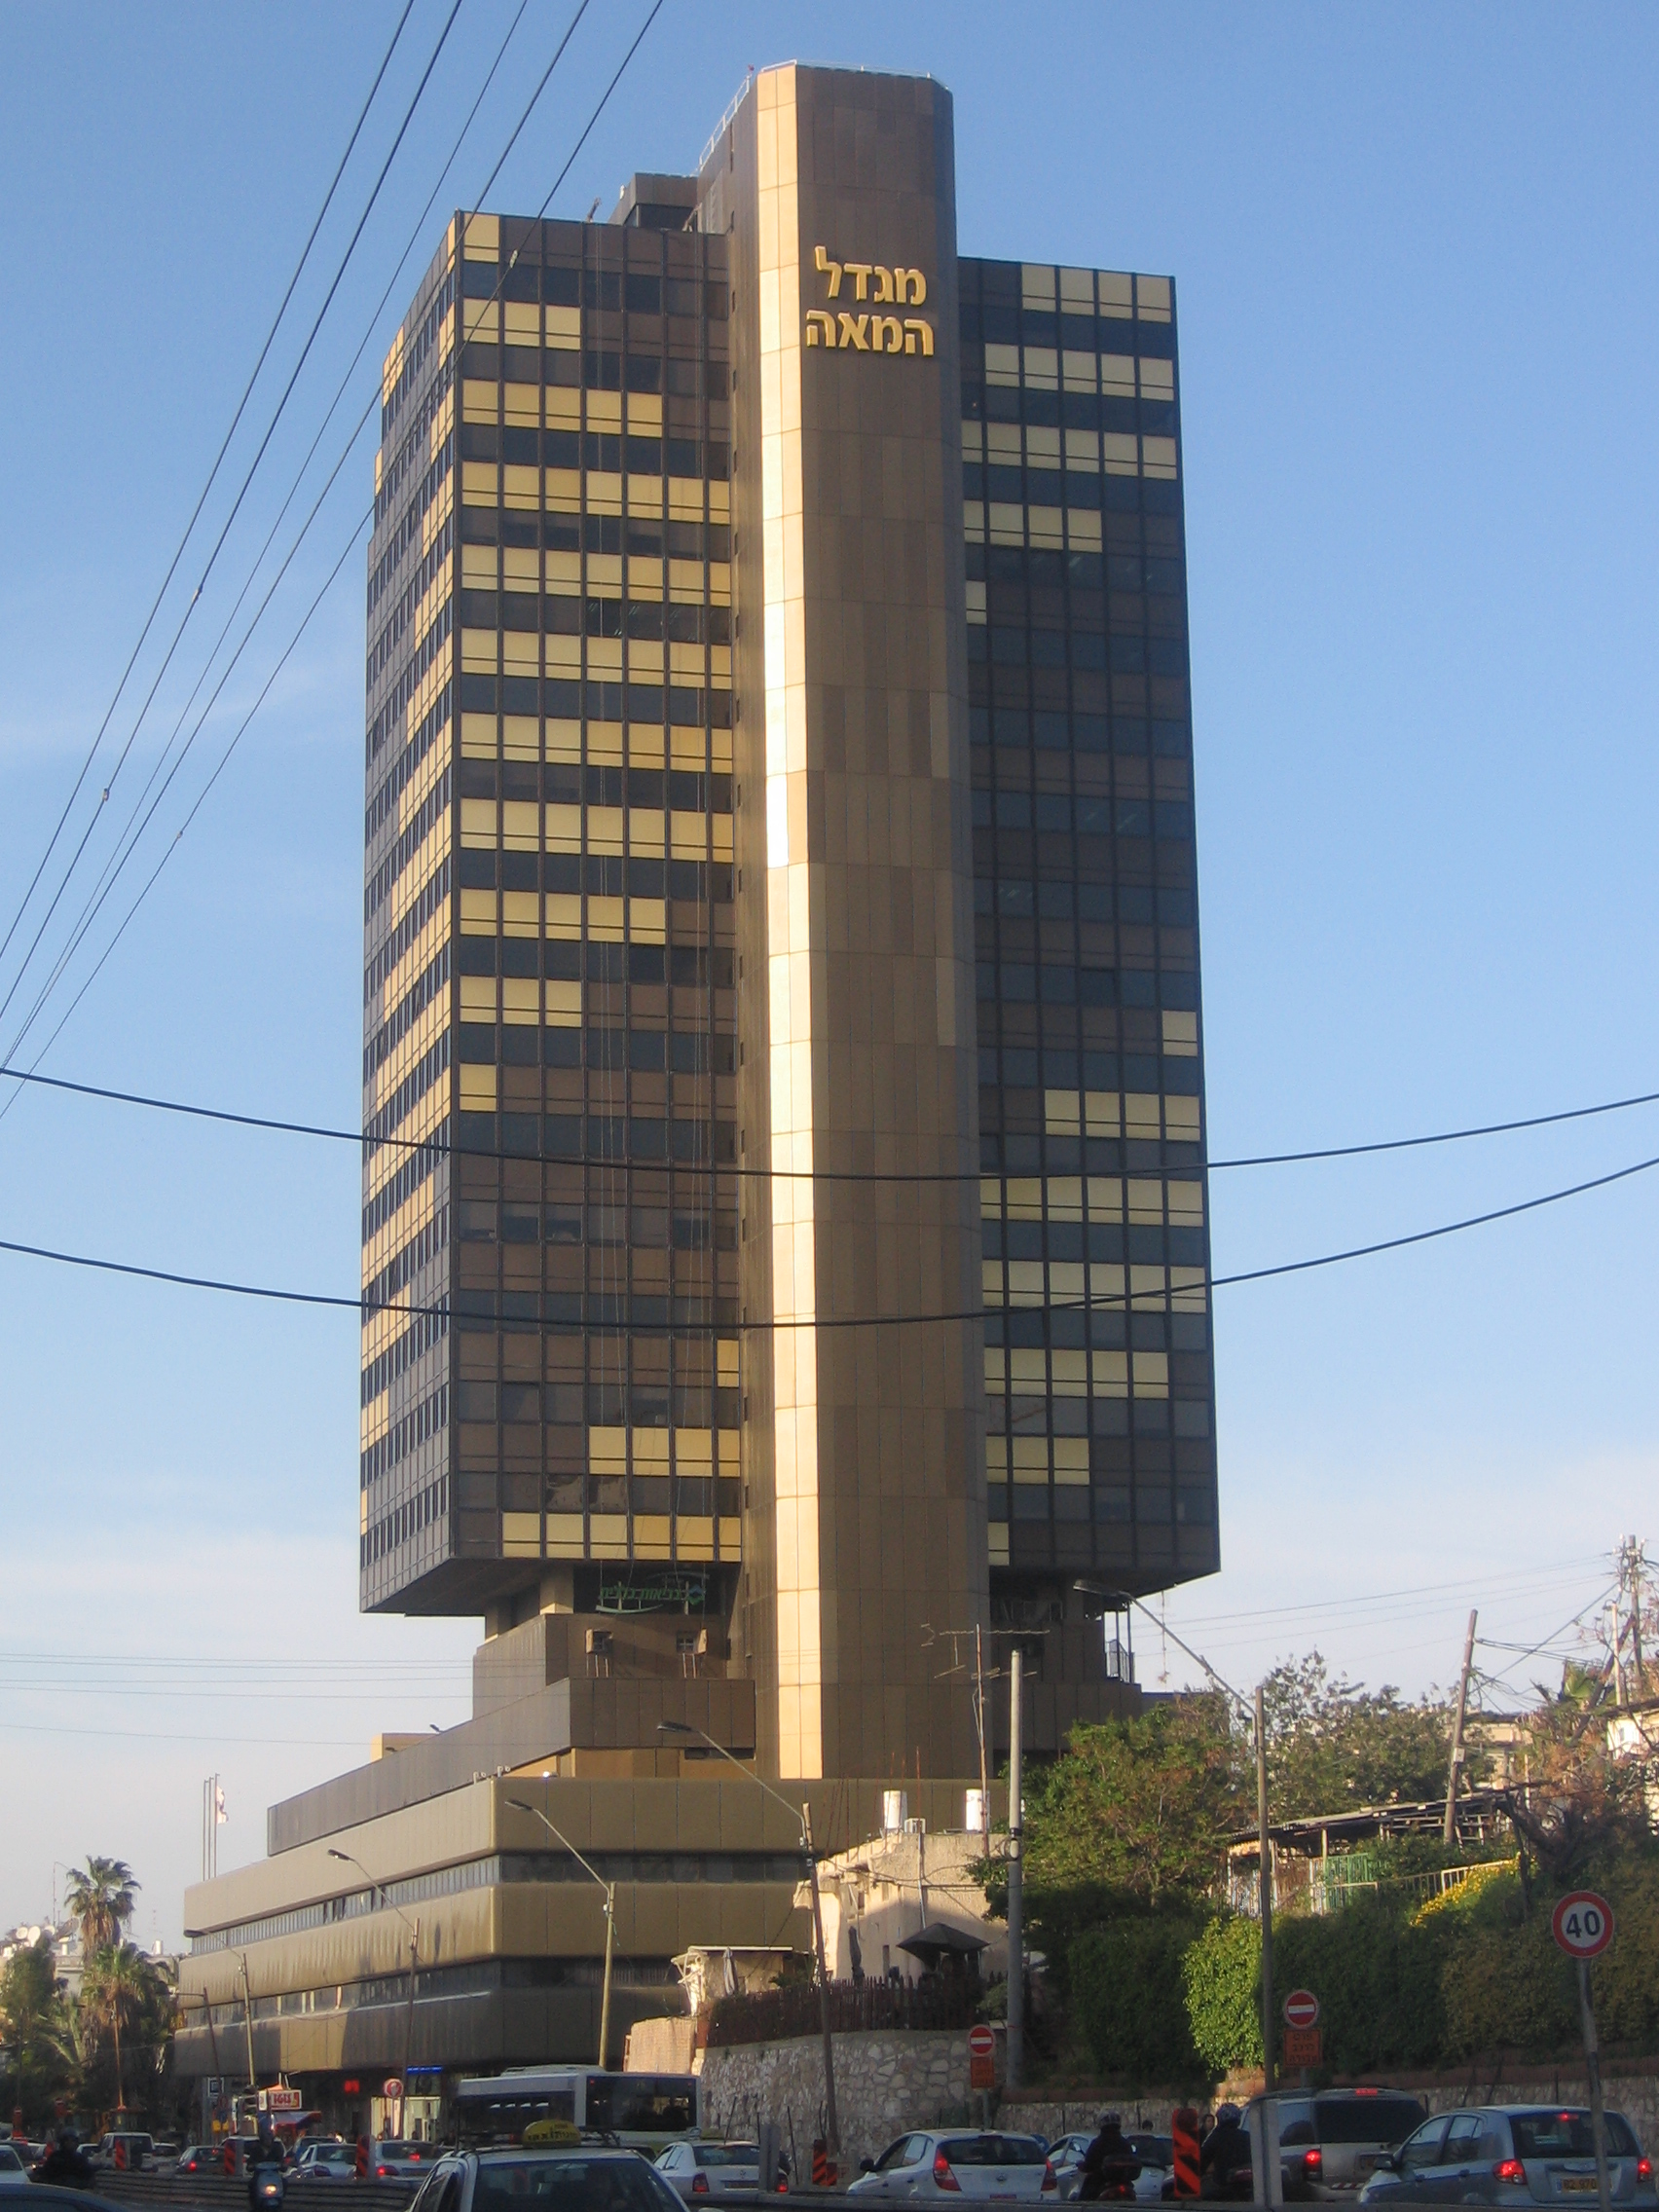 31.03.09_Tel_Aviv_094_Hame%27ea_Tower.JP